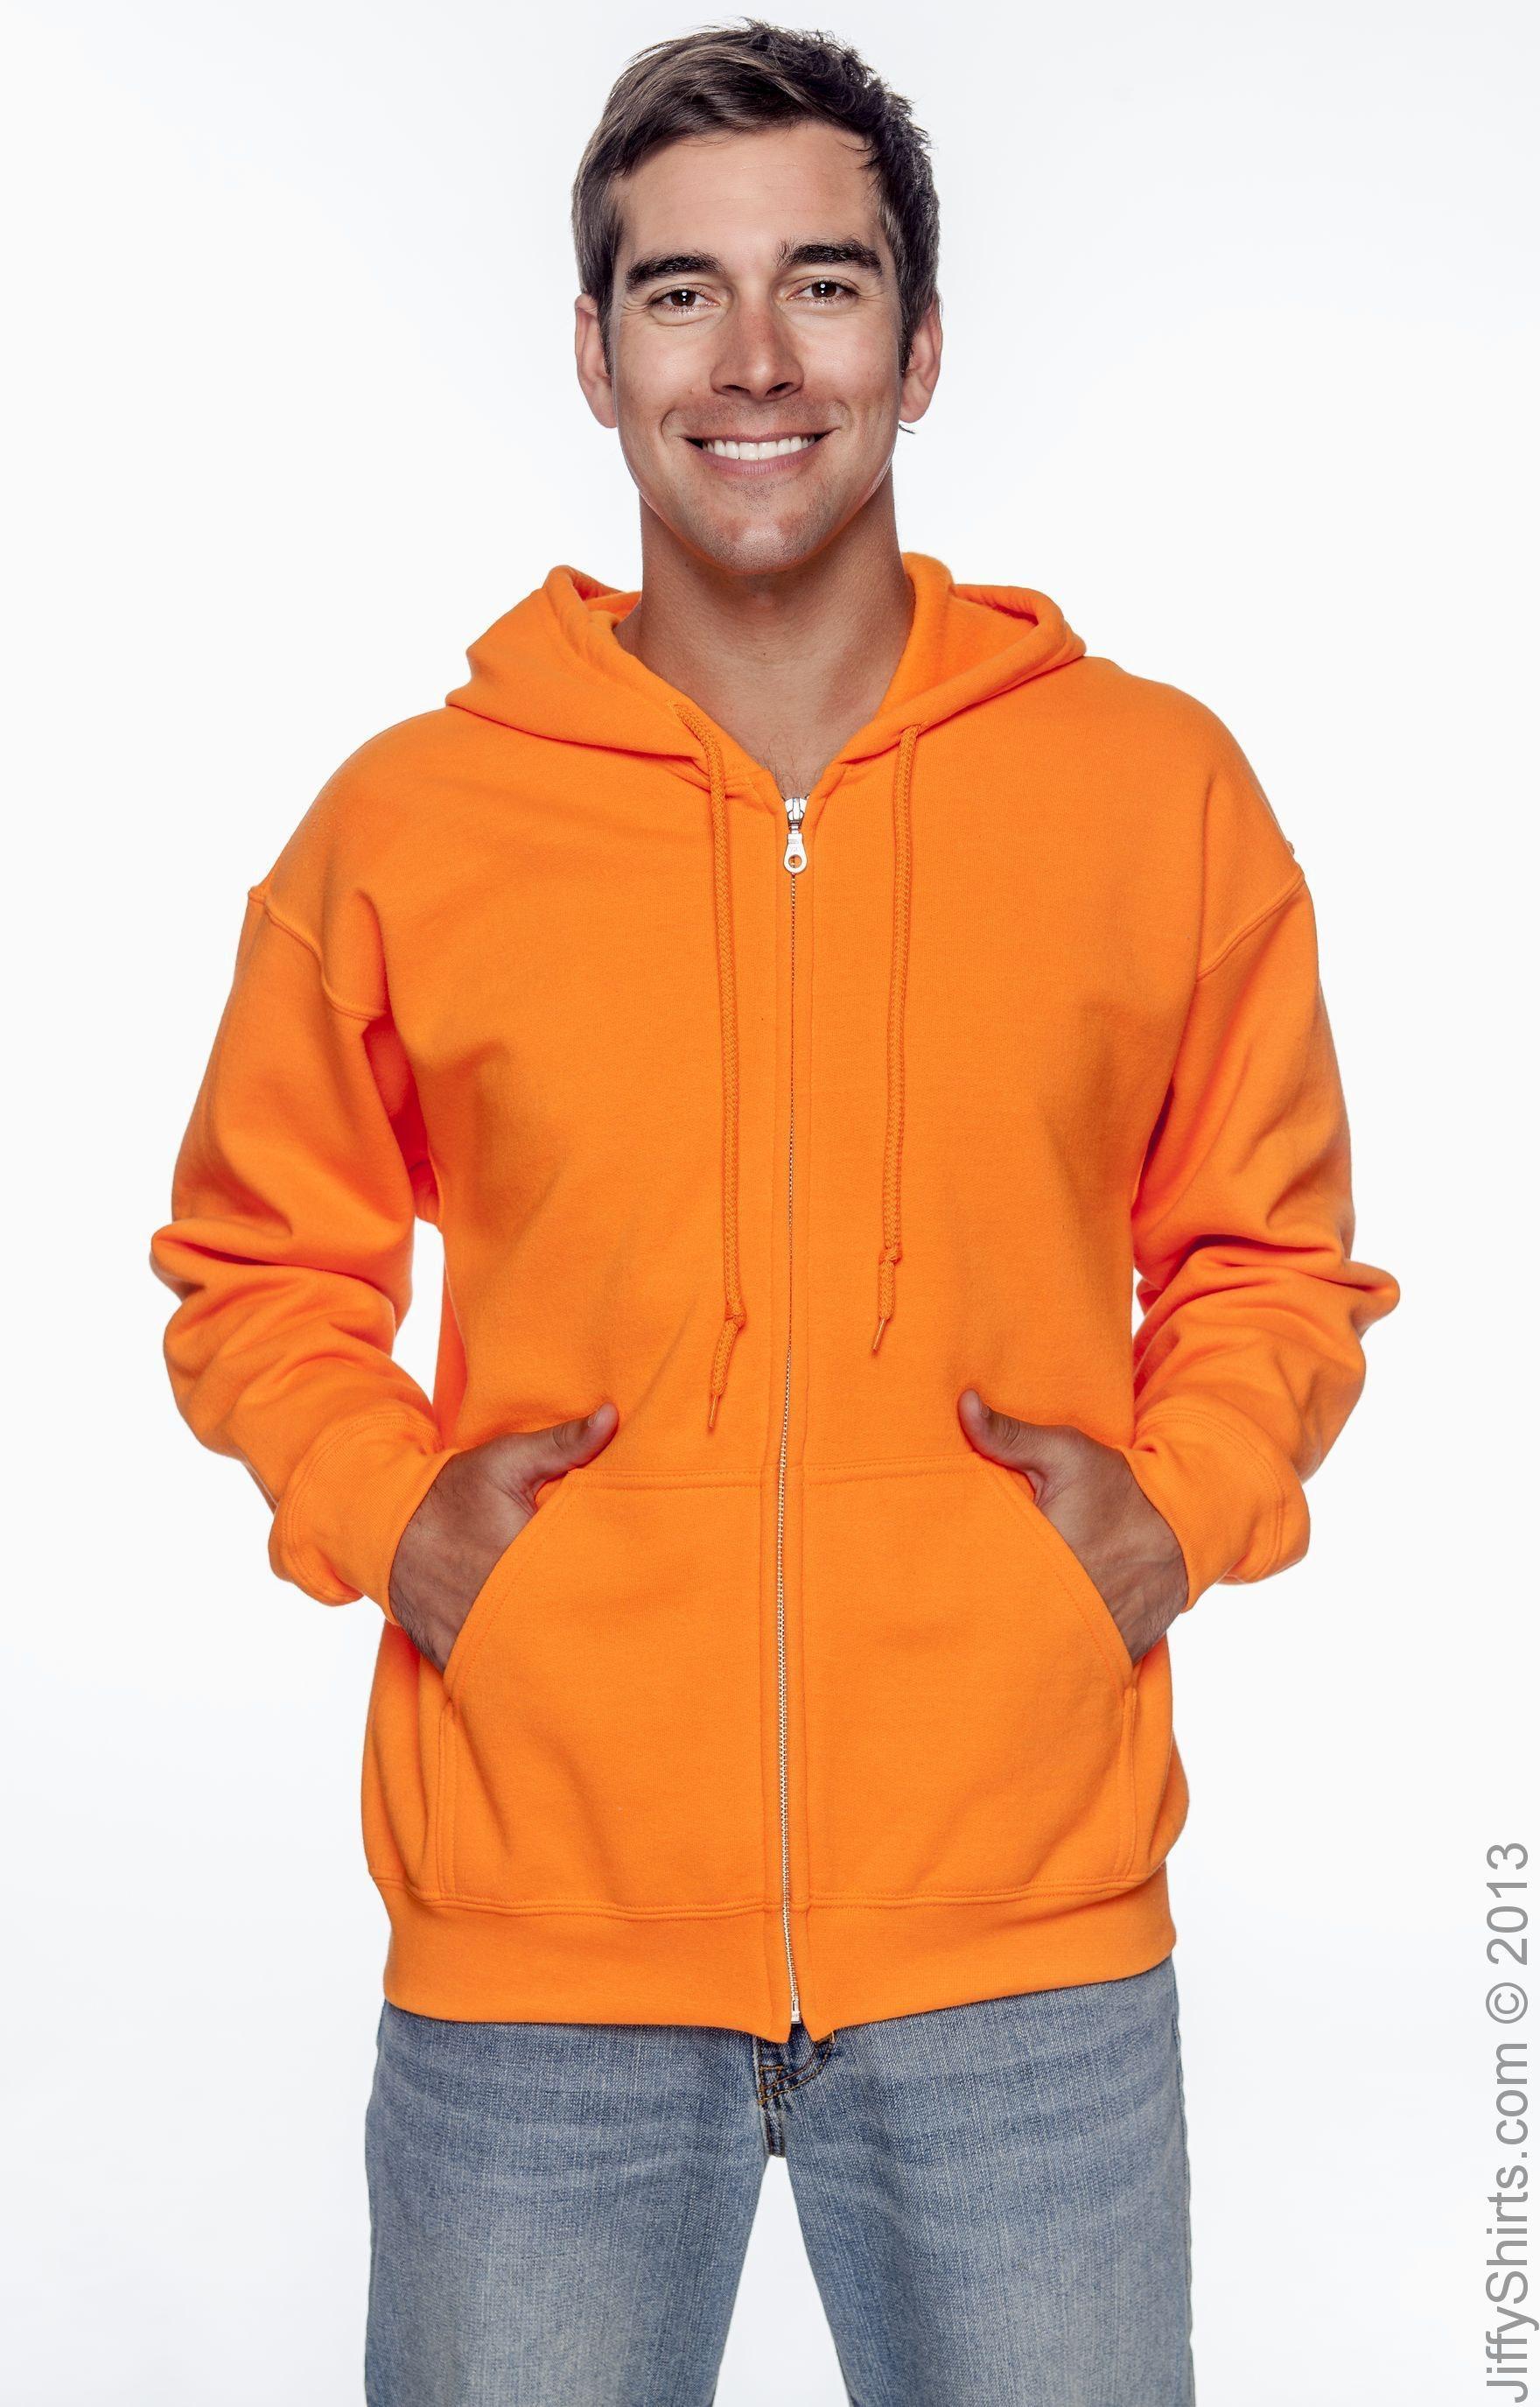 Gildan G126 High Viz Safety Orange